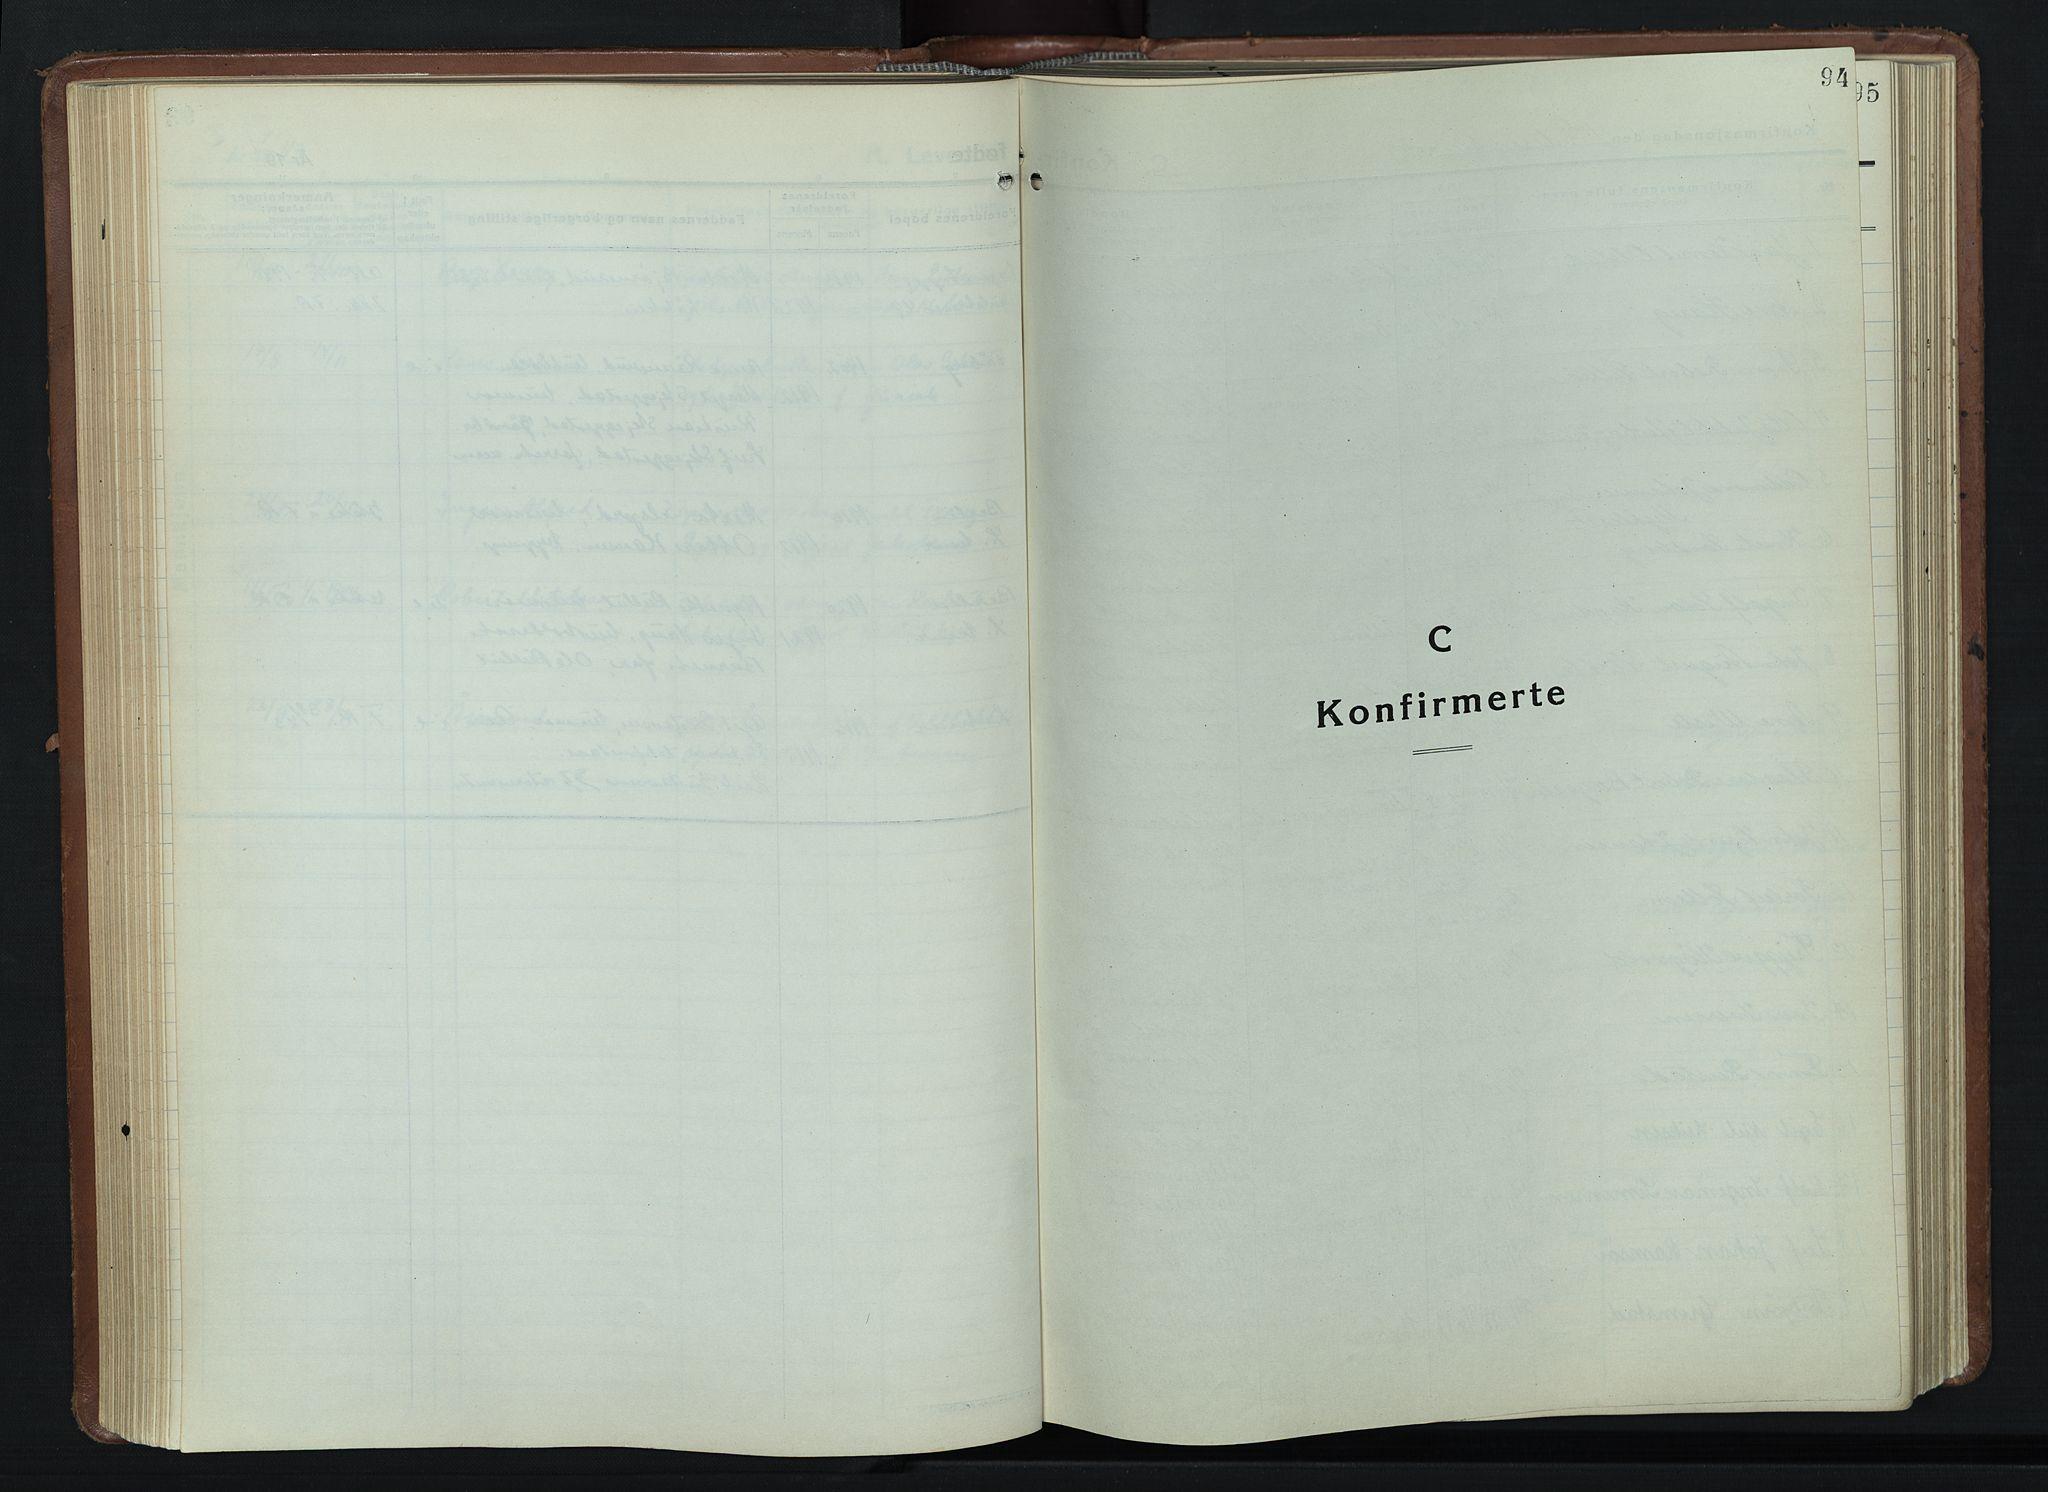 SAH, Lillehammer prestekontor, H/Ha/Hab/L0003: Parish register (copy) no. 3, 1927-1943, p. 94